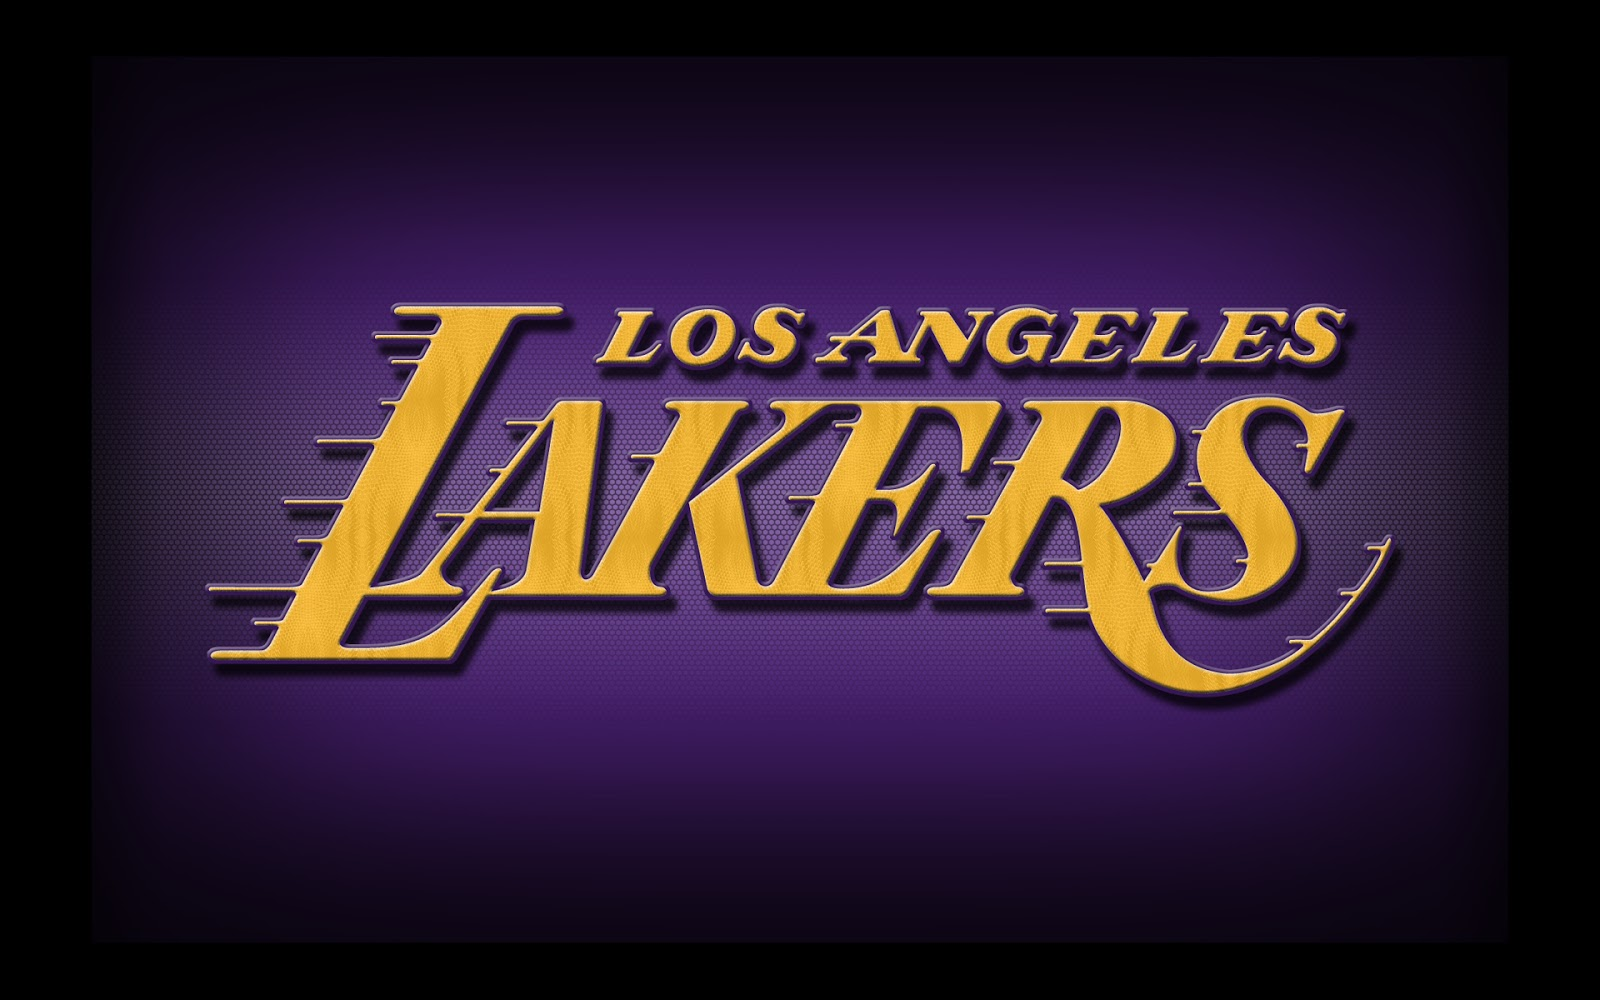 La Lakers Basketball Club Logos Wallpapers 2013 - Its All ...